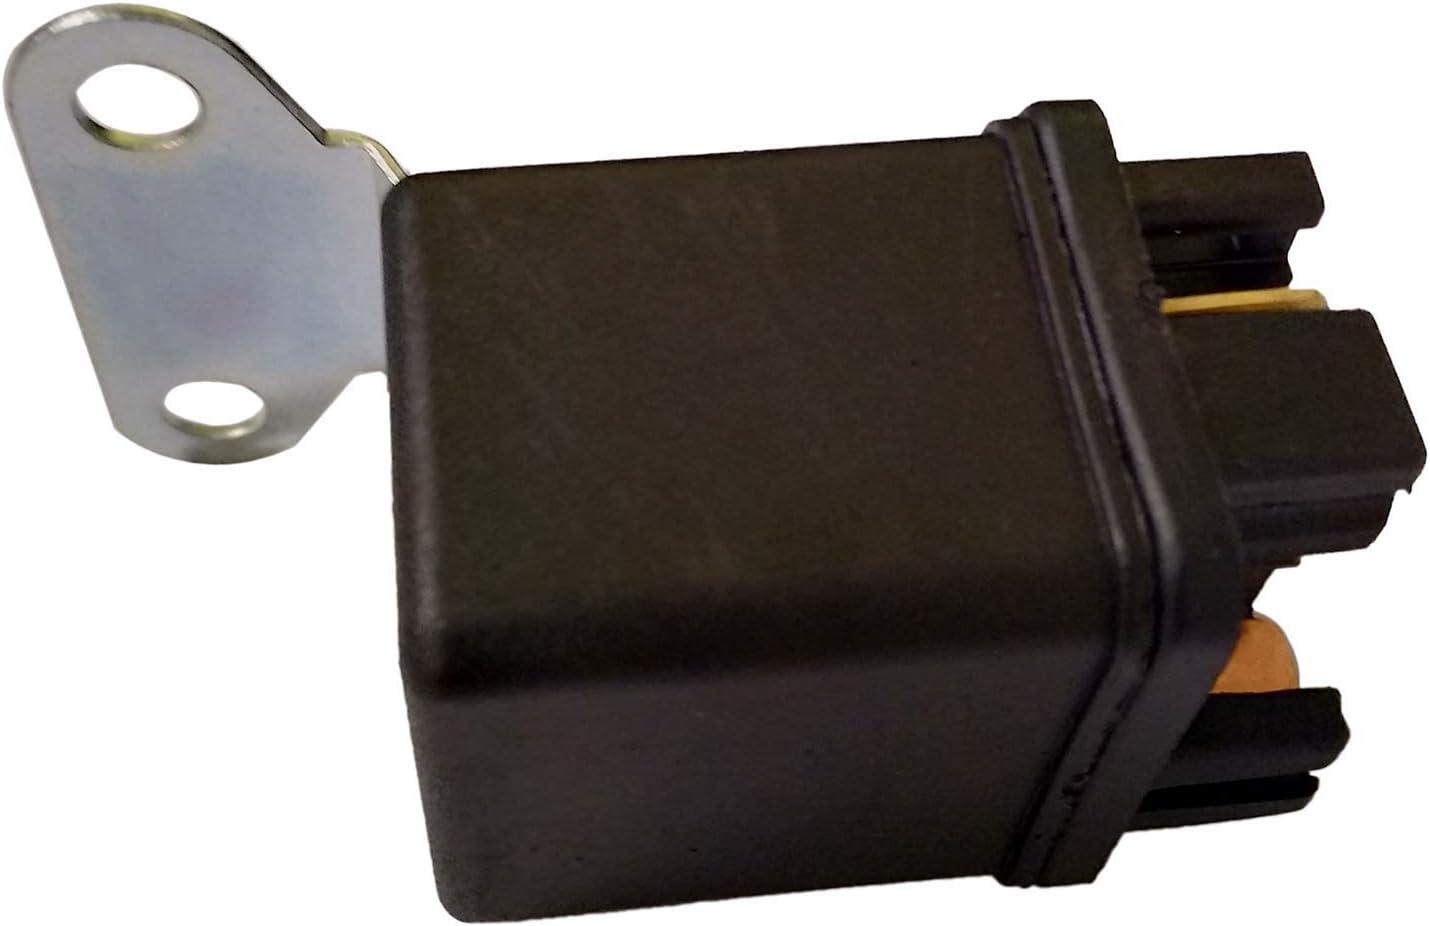 FridayParts 12V Preheating Relay MR8B-451 MM43128202 MM43128201 for Mitsubishi